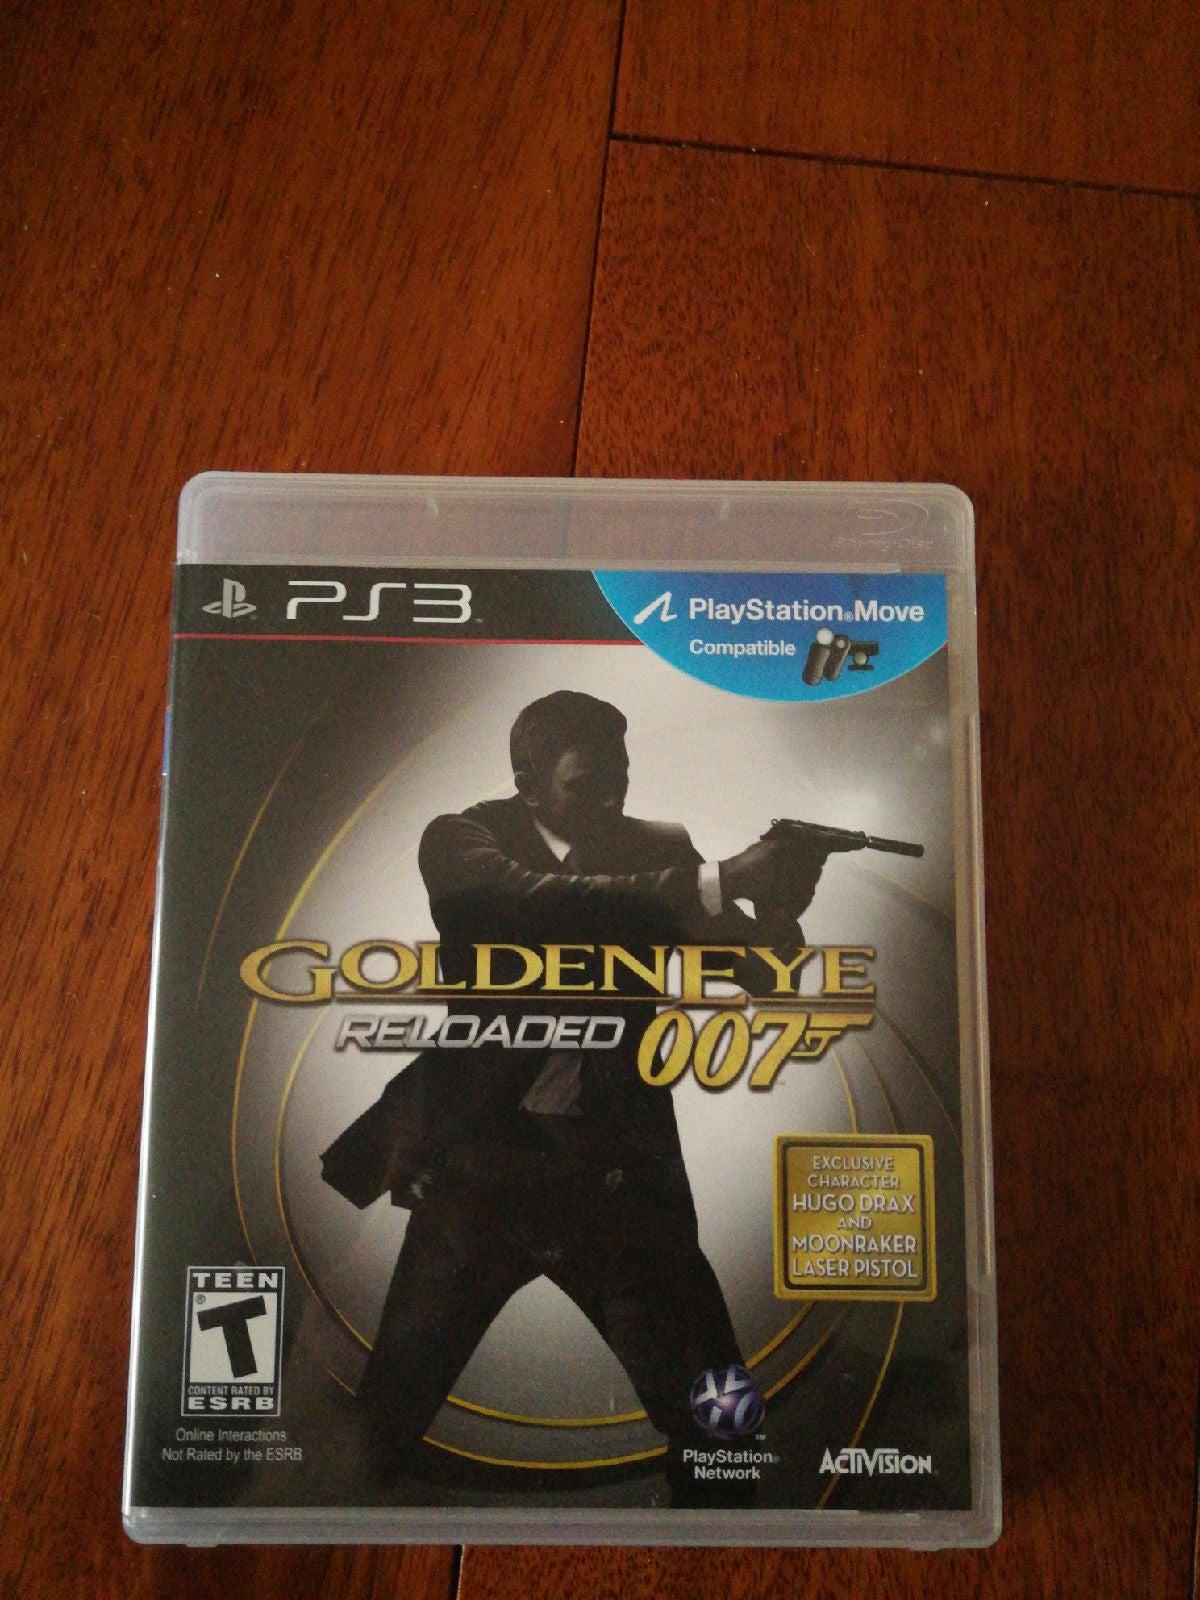 ps3 game GoldenEye Reloaded 007